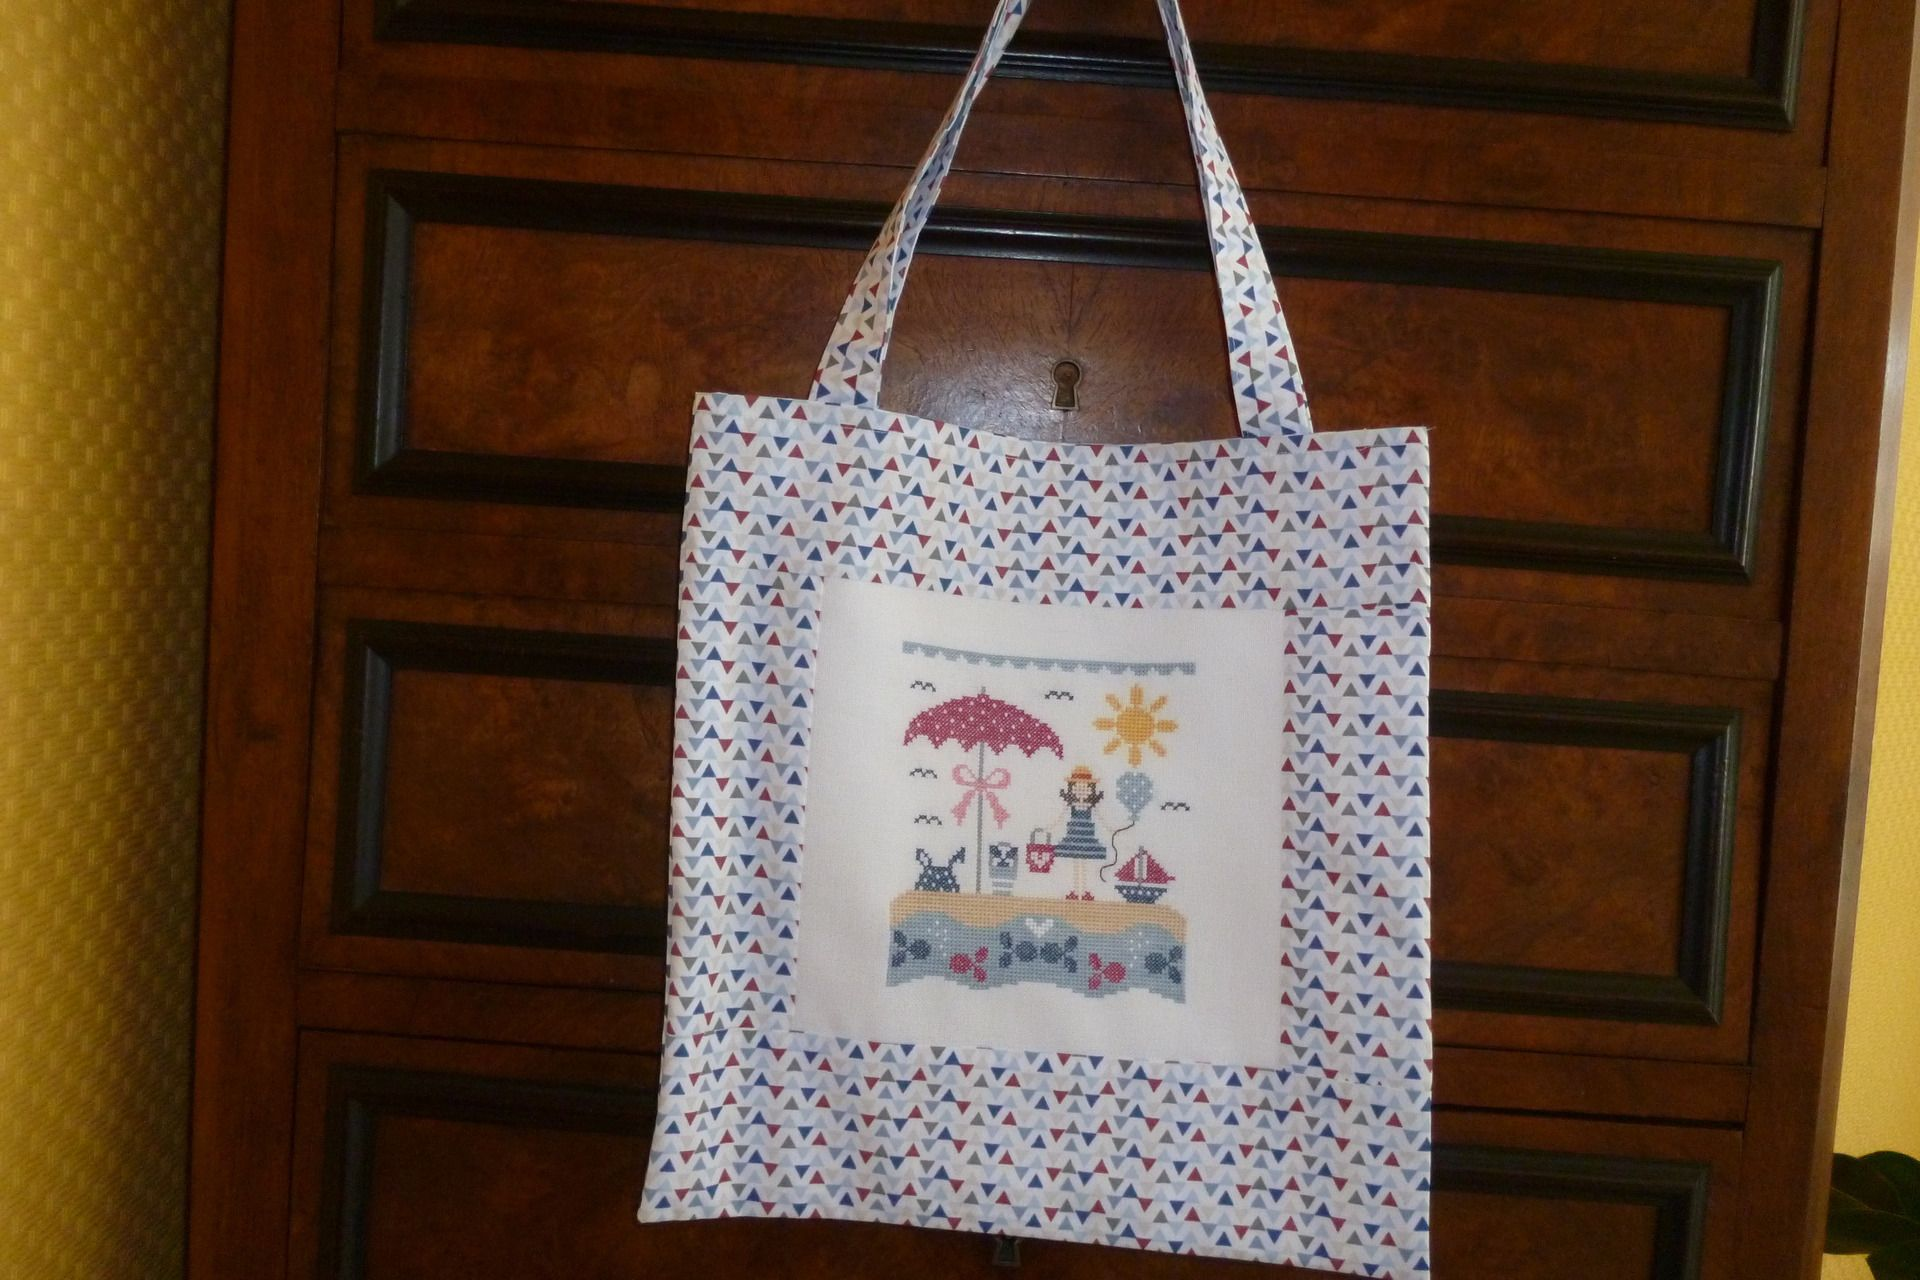 Main L'été Sent Esprit Marin Bag Sacs Bon Tote En Qui Tissu À 8Bx6wcP4q